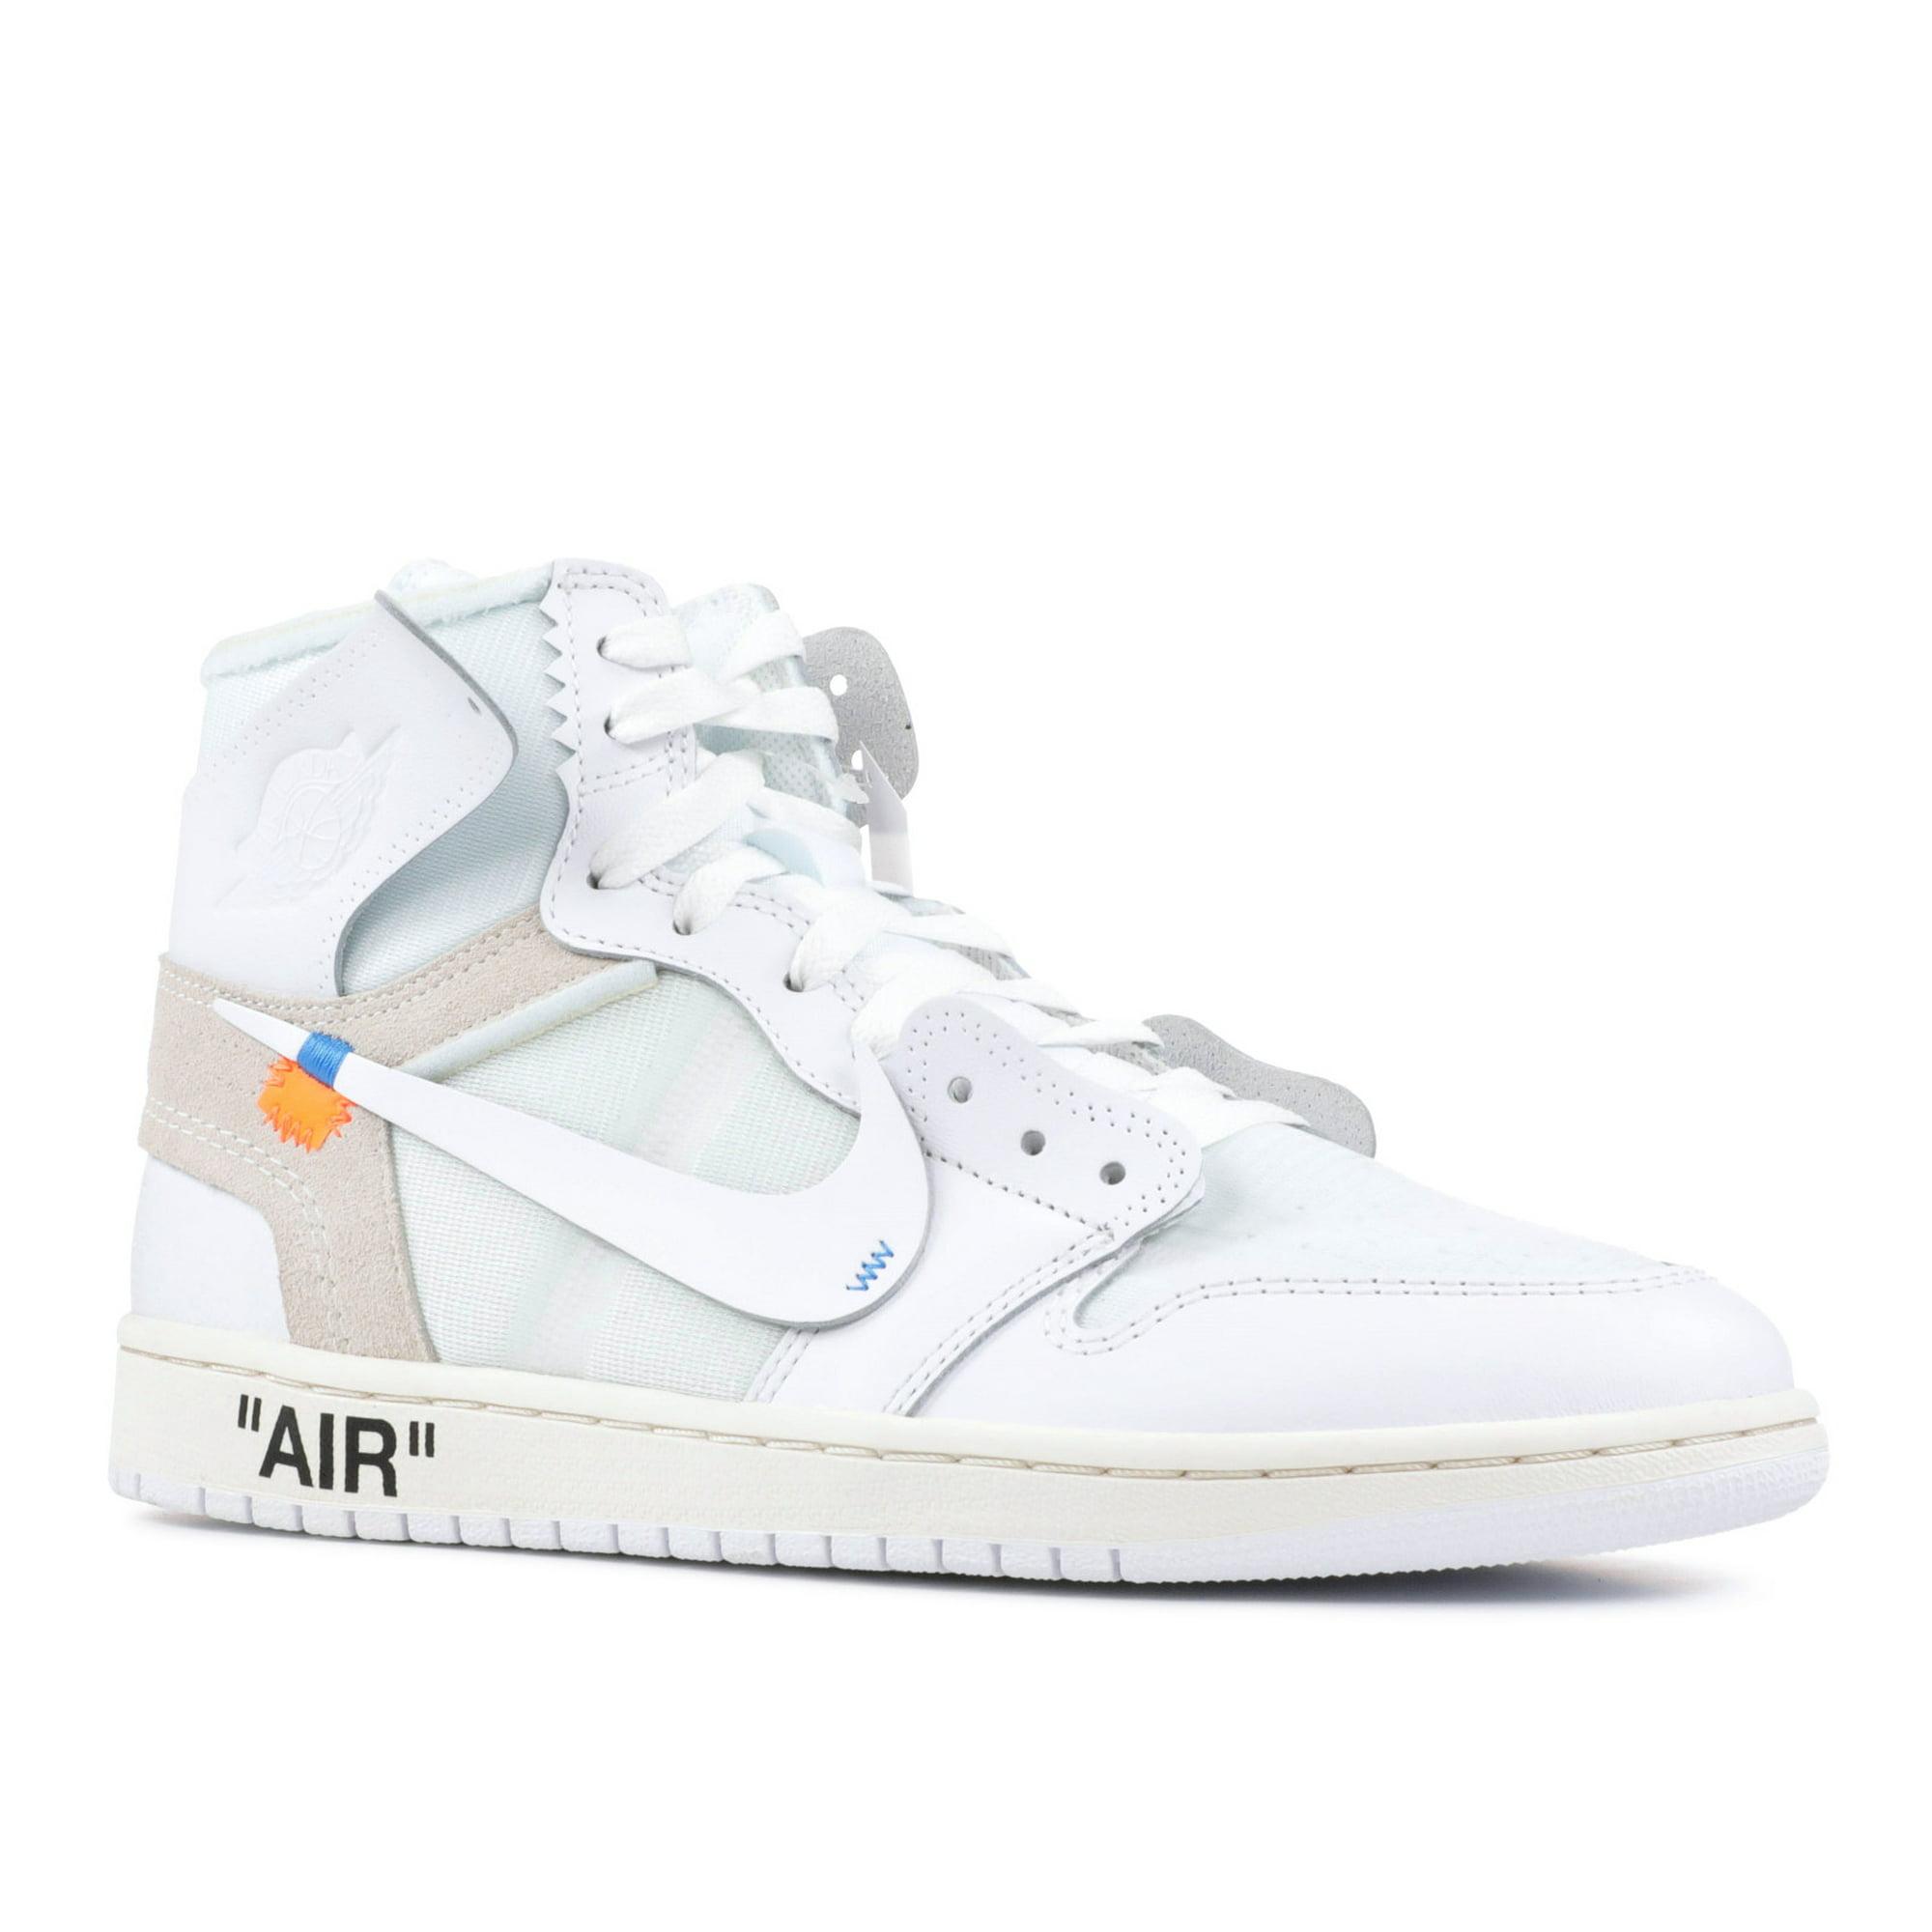 quality design 6008d 99307 Air Jordan - Men - Air Jordan 1 X Off-White Nrg